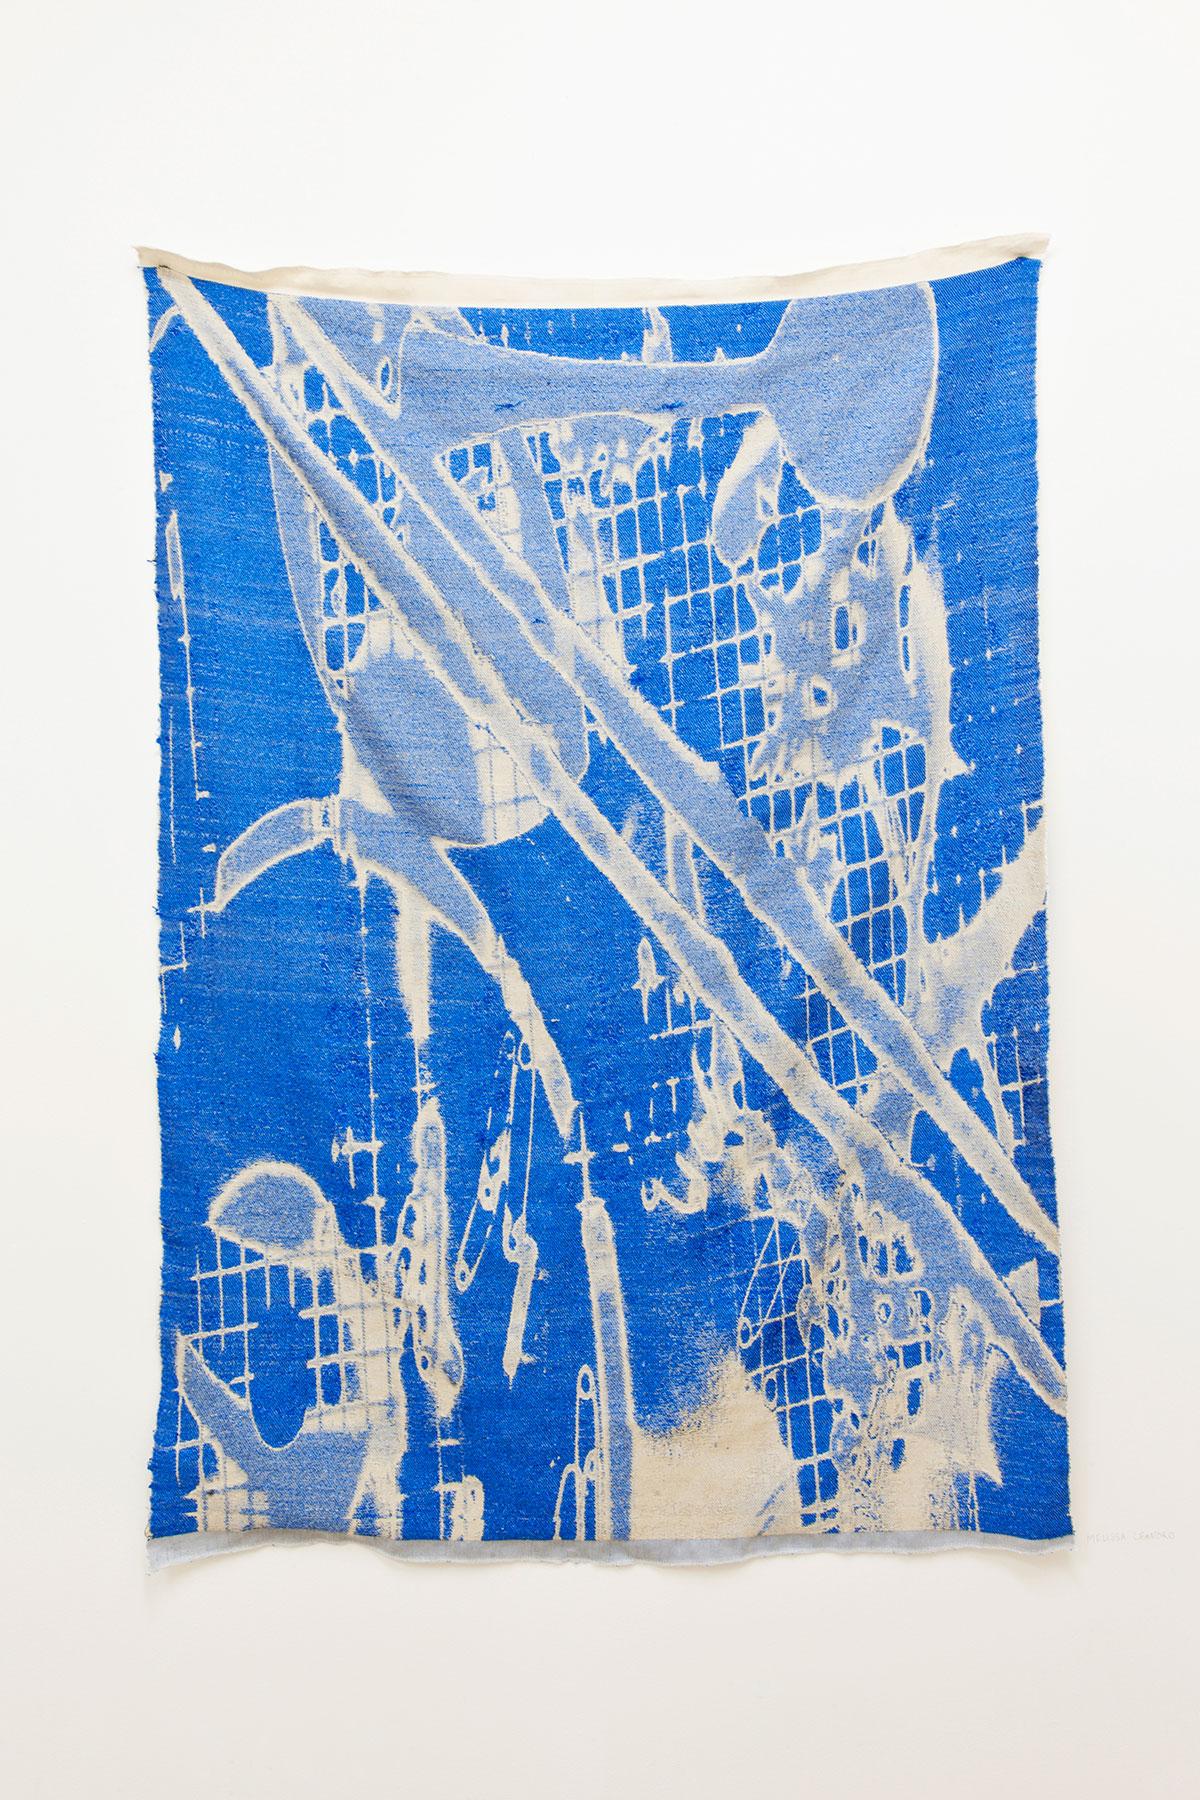 Melissa Leandro. Collection No. 1.